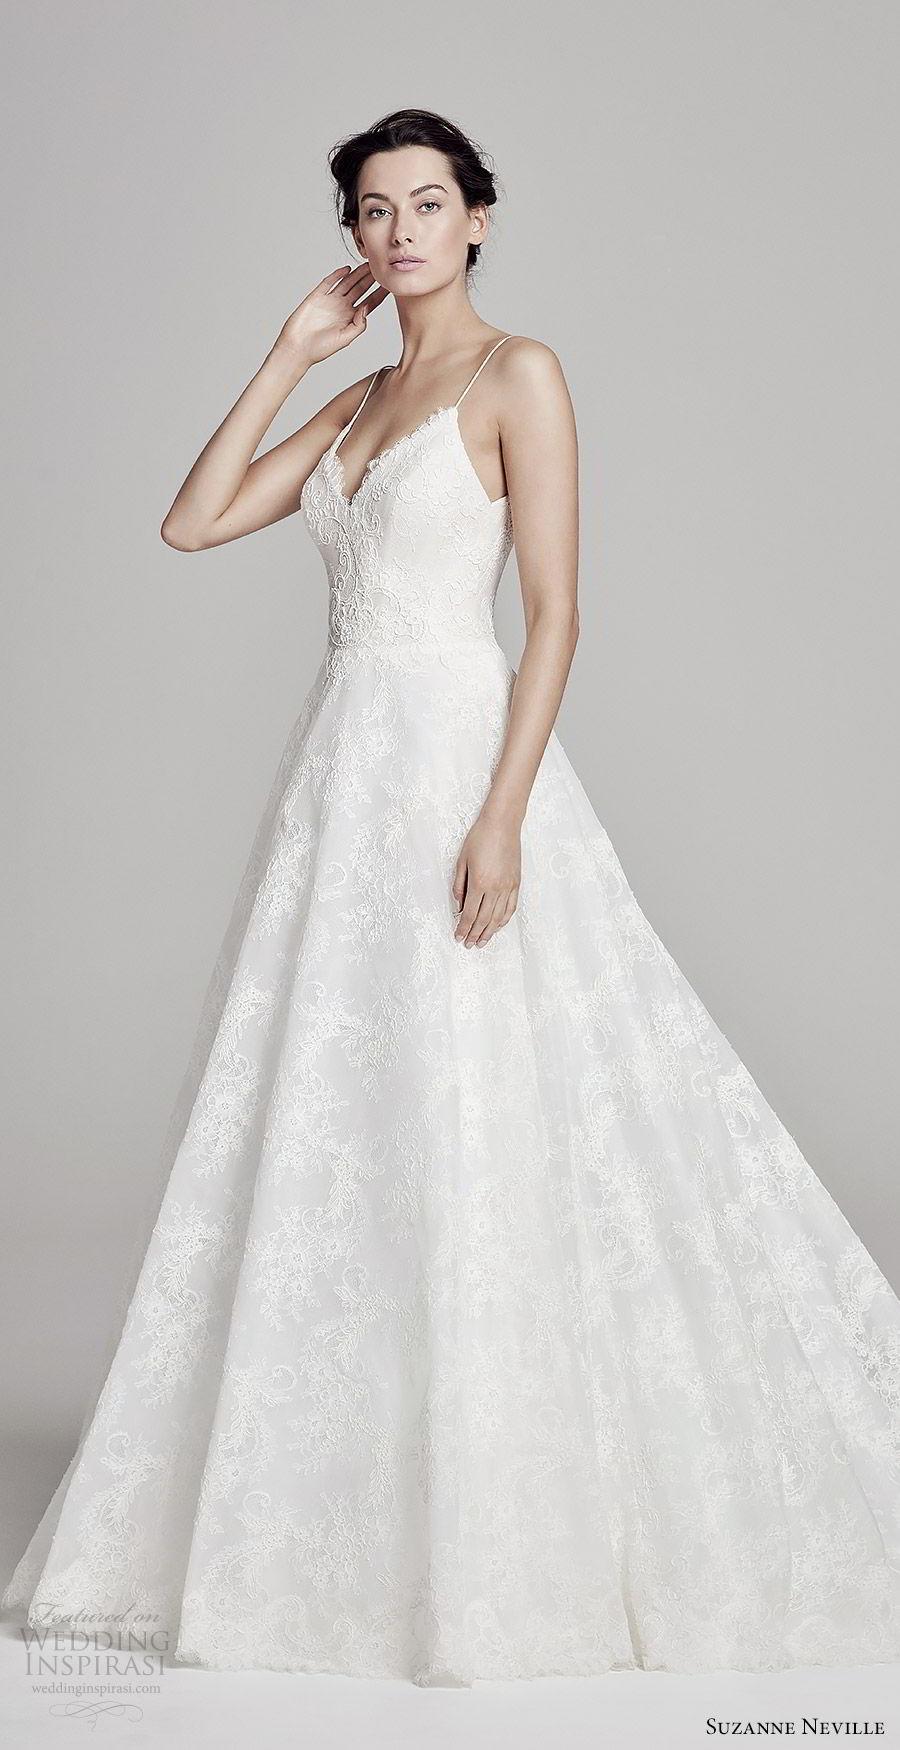 suzanne neville bridal 2019 sleeveless thin straps sweetheart neckline a line ball gown lace wedding dress (harlow) romantic elegant mv